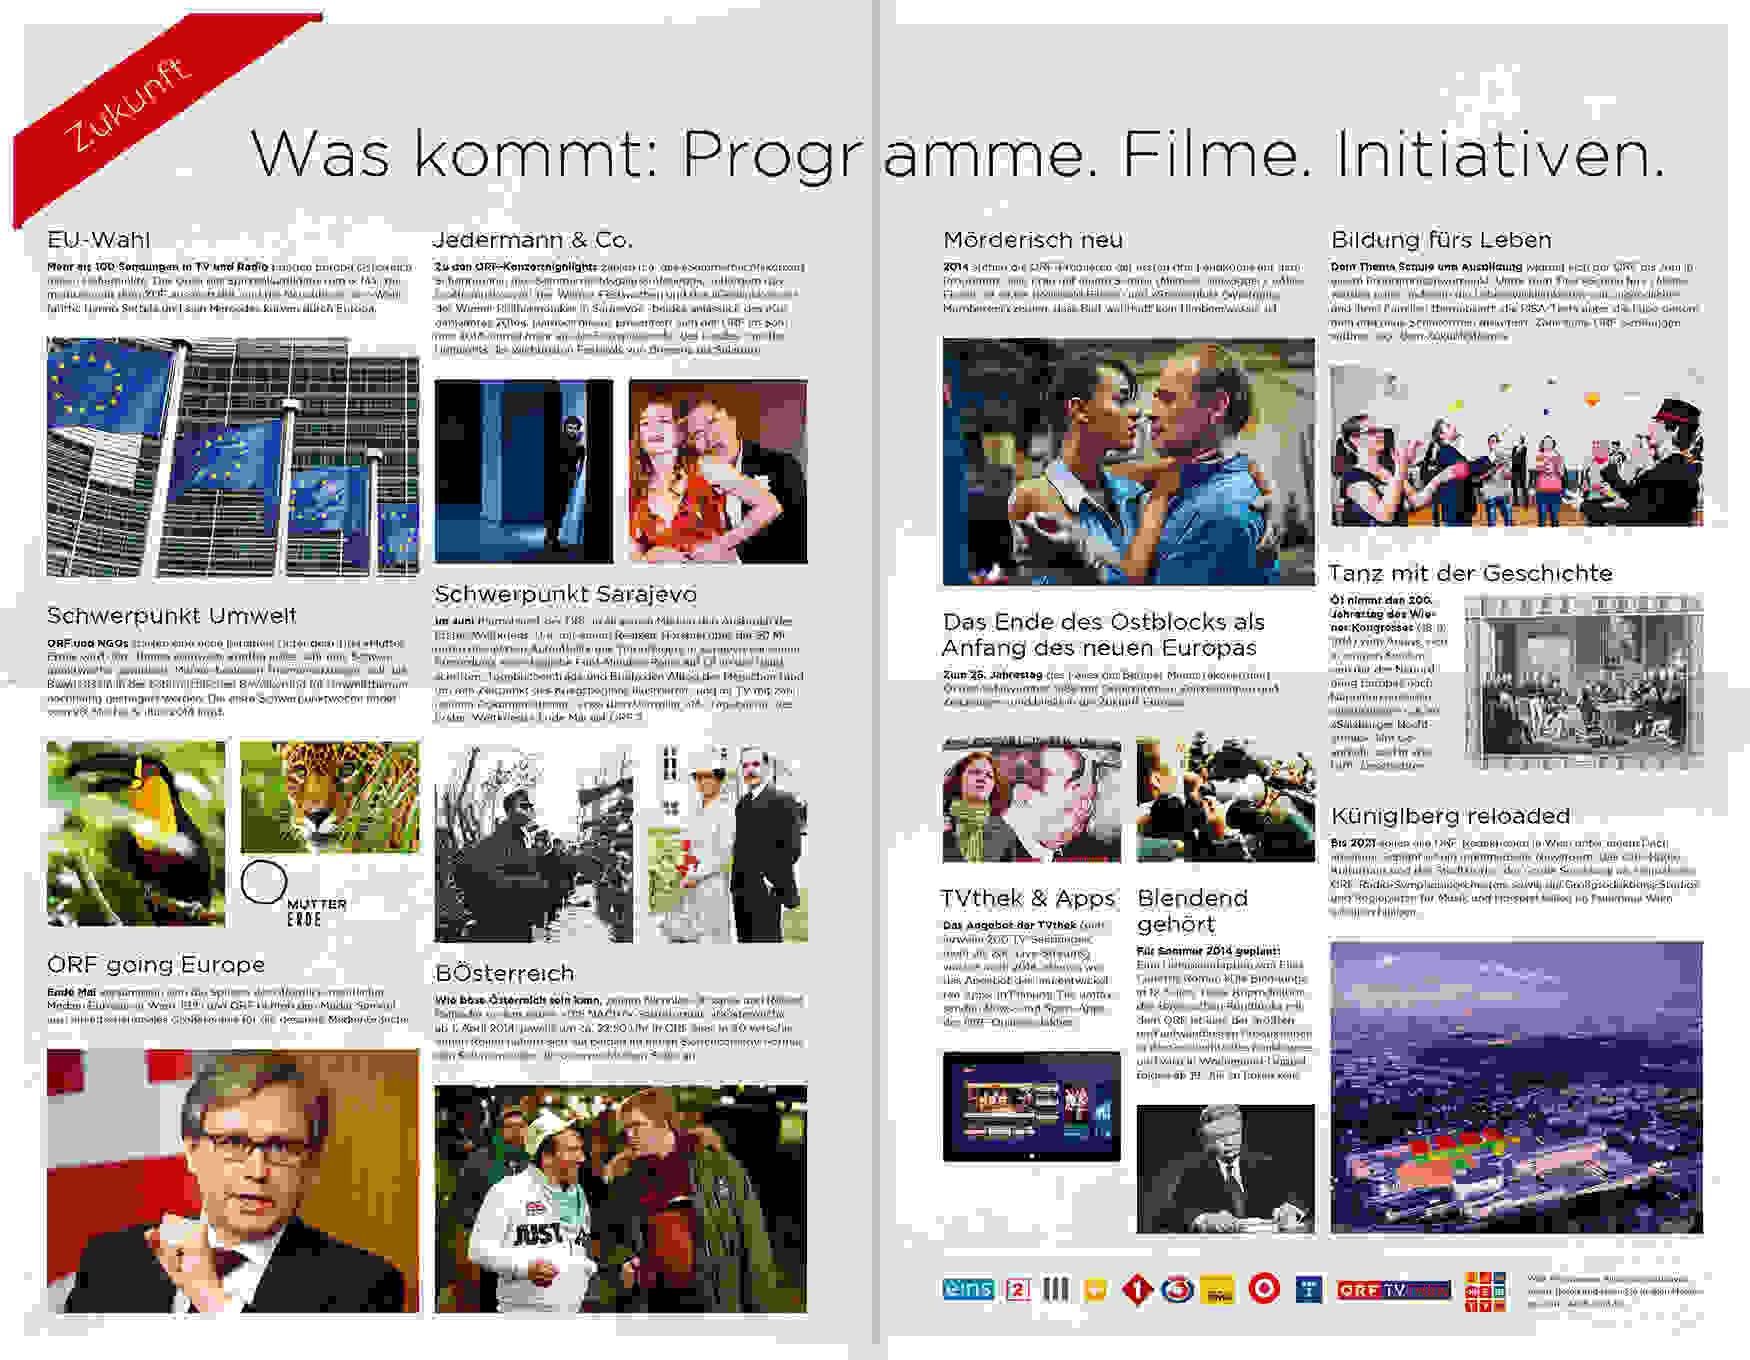 ORF PV 2014 Zeitung Doppelseite 7